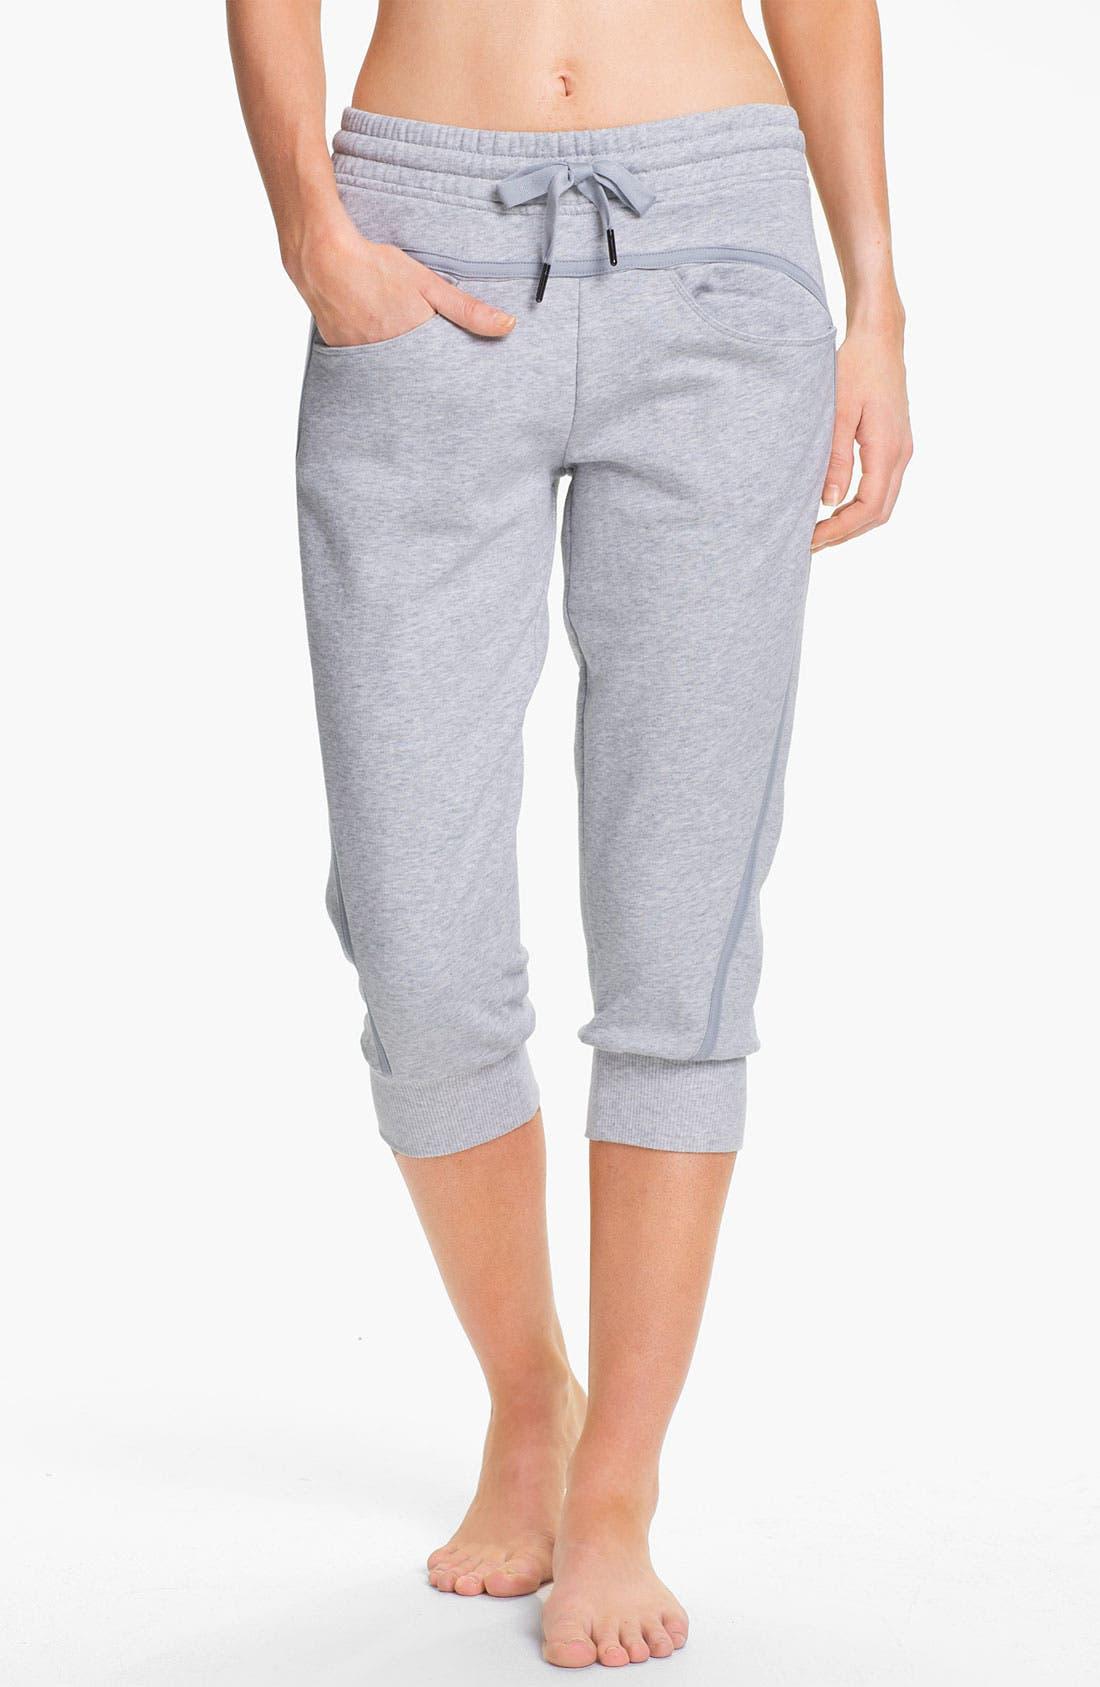 Alternate Image 1 Selected - adidas by Stella McCartney 'Essentials' Three-Quarter Sweatpants